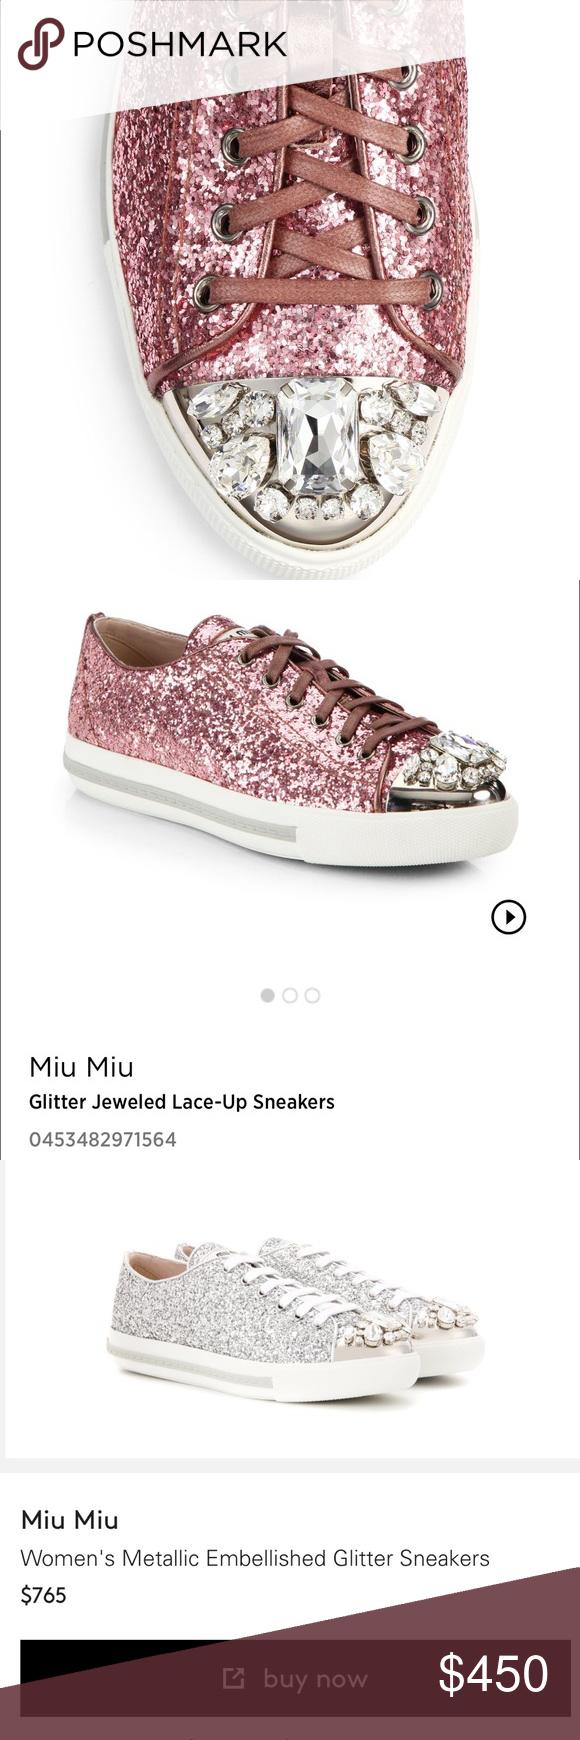 d8b75a28d87 Selling this Miu Miu Prada Swarovski Cratals Sneakers size 5.5 in my  Poshmark closet! My username is  cob17.  shopmycloset  poshmark  fashion   shopping ...